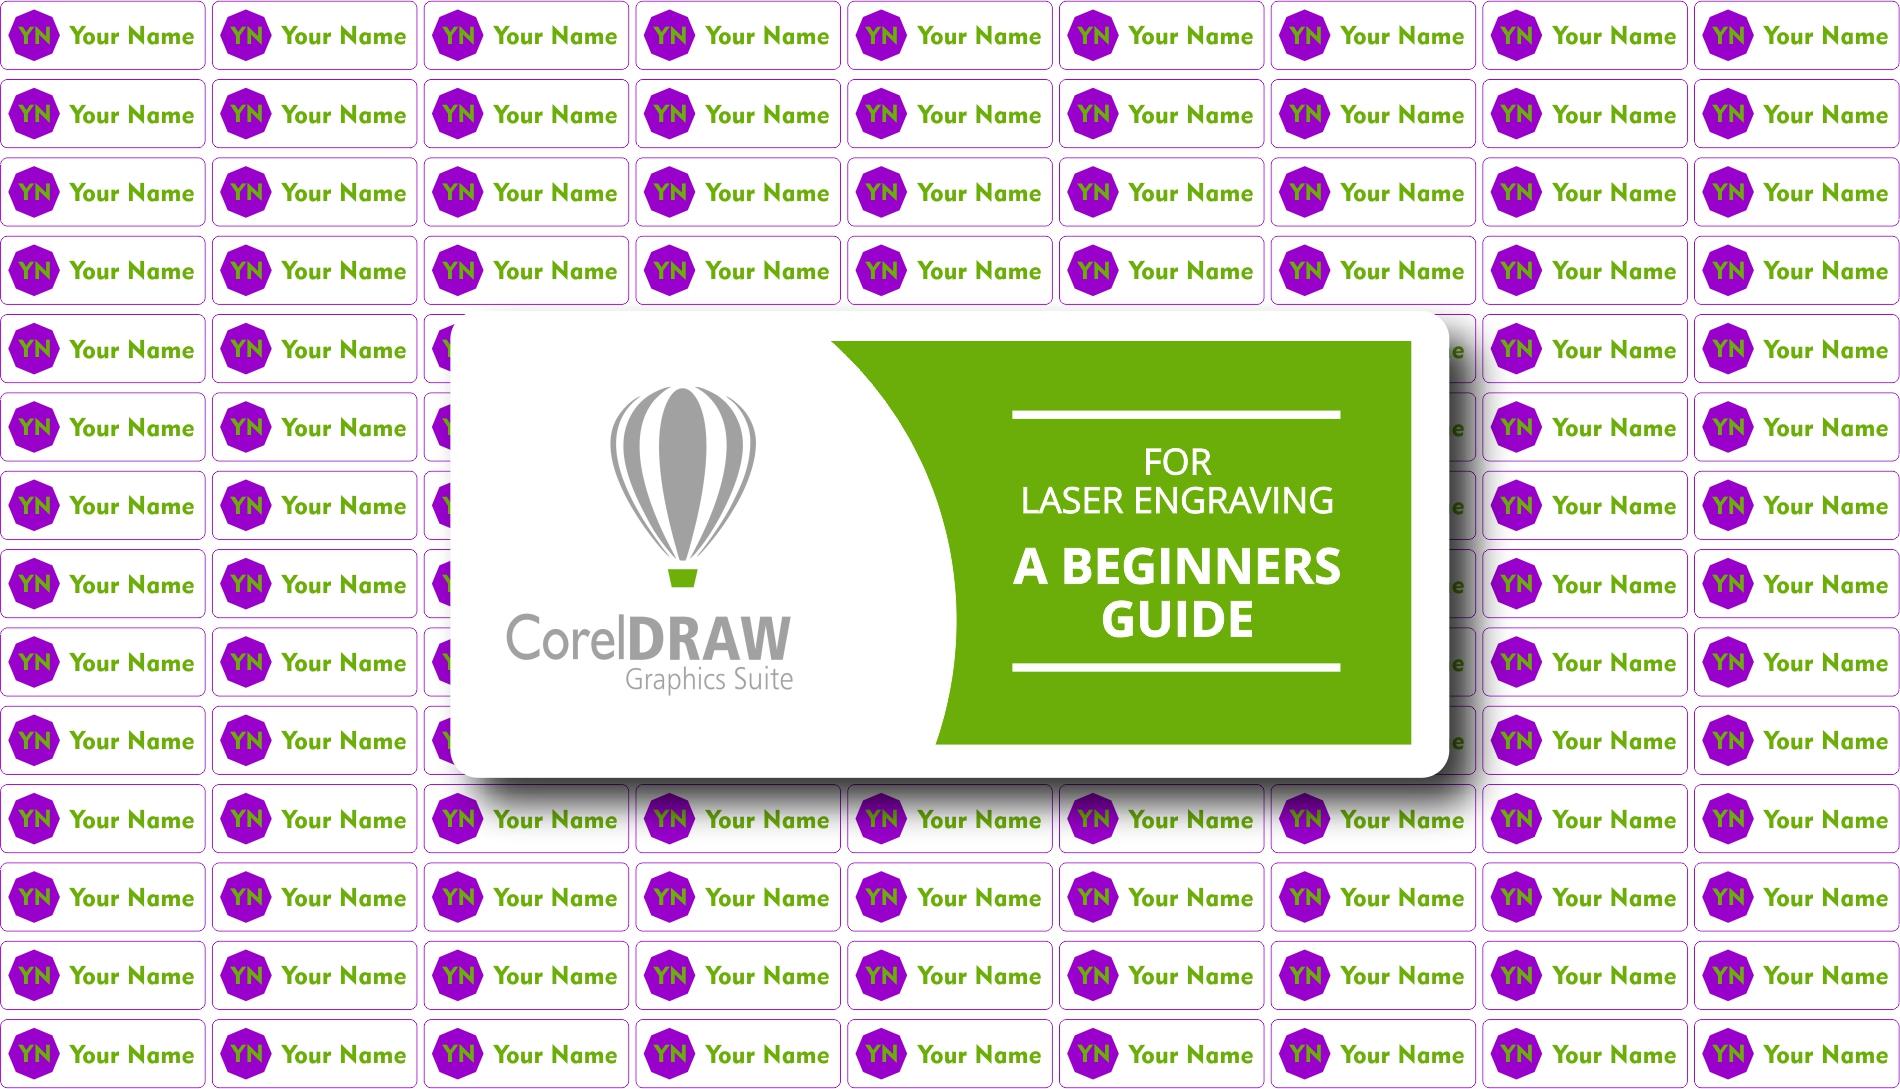 CorelDraw for Laser Cutting & Engraving - Essential Skills